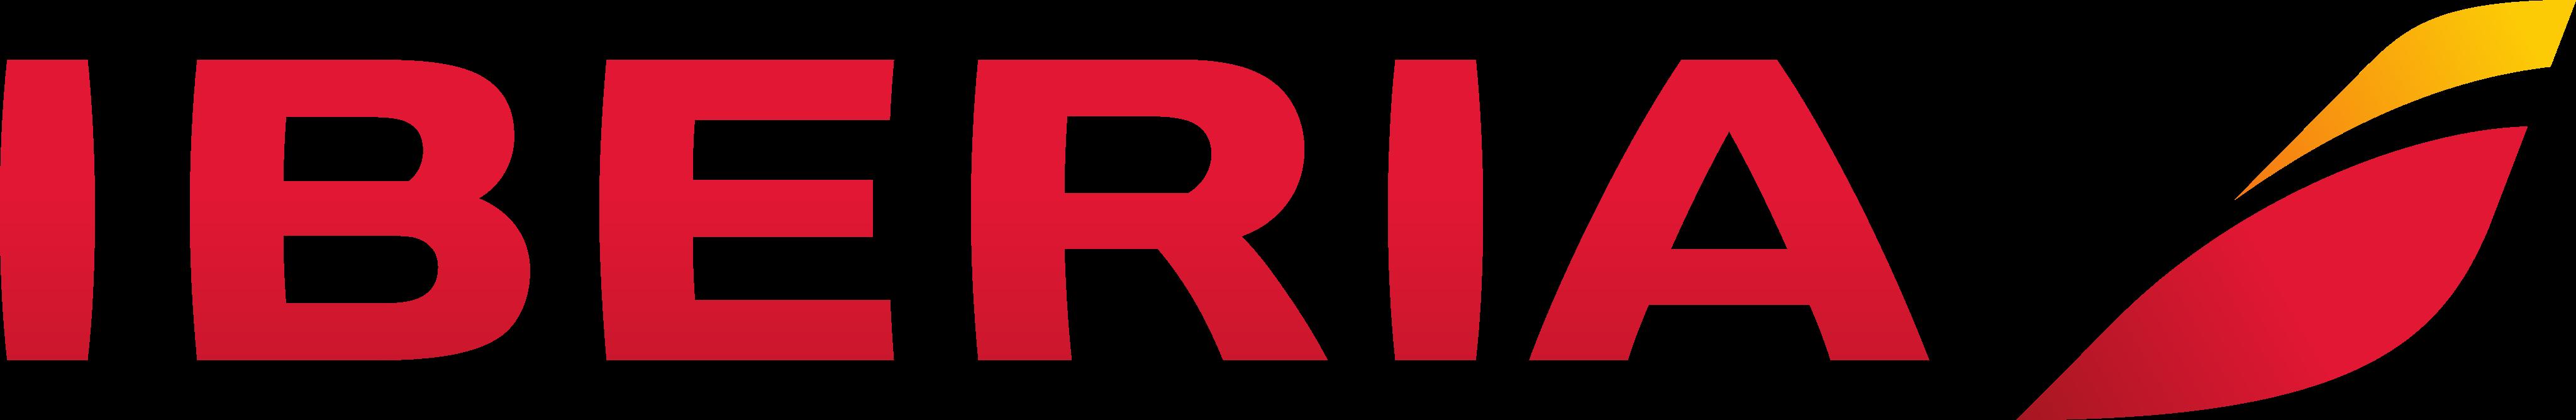 iberia logo 1 - Iberia Logo